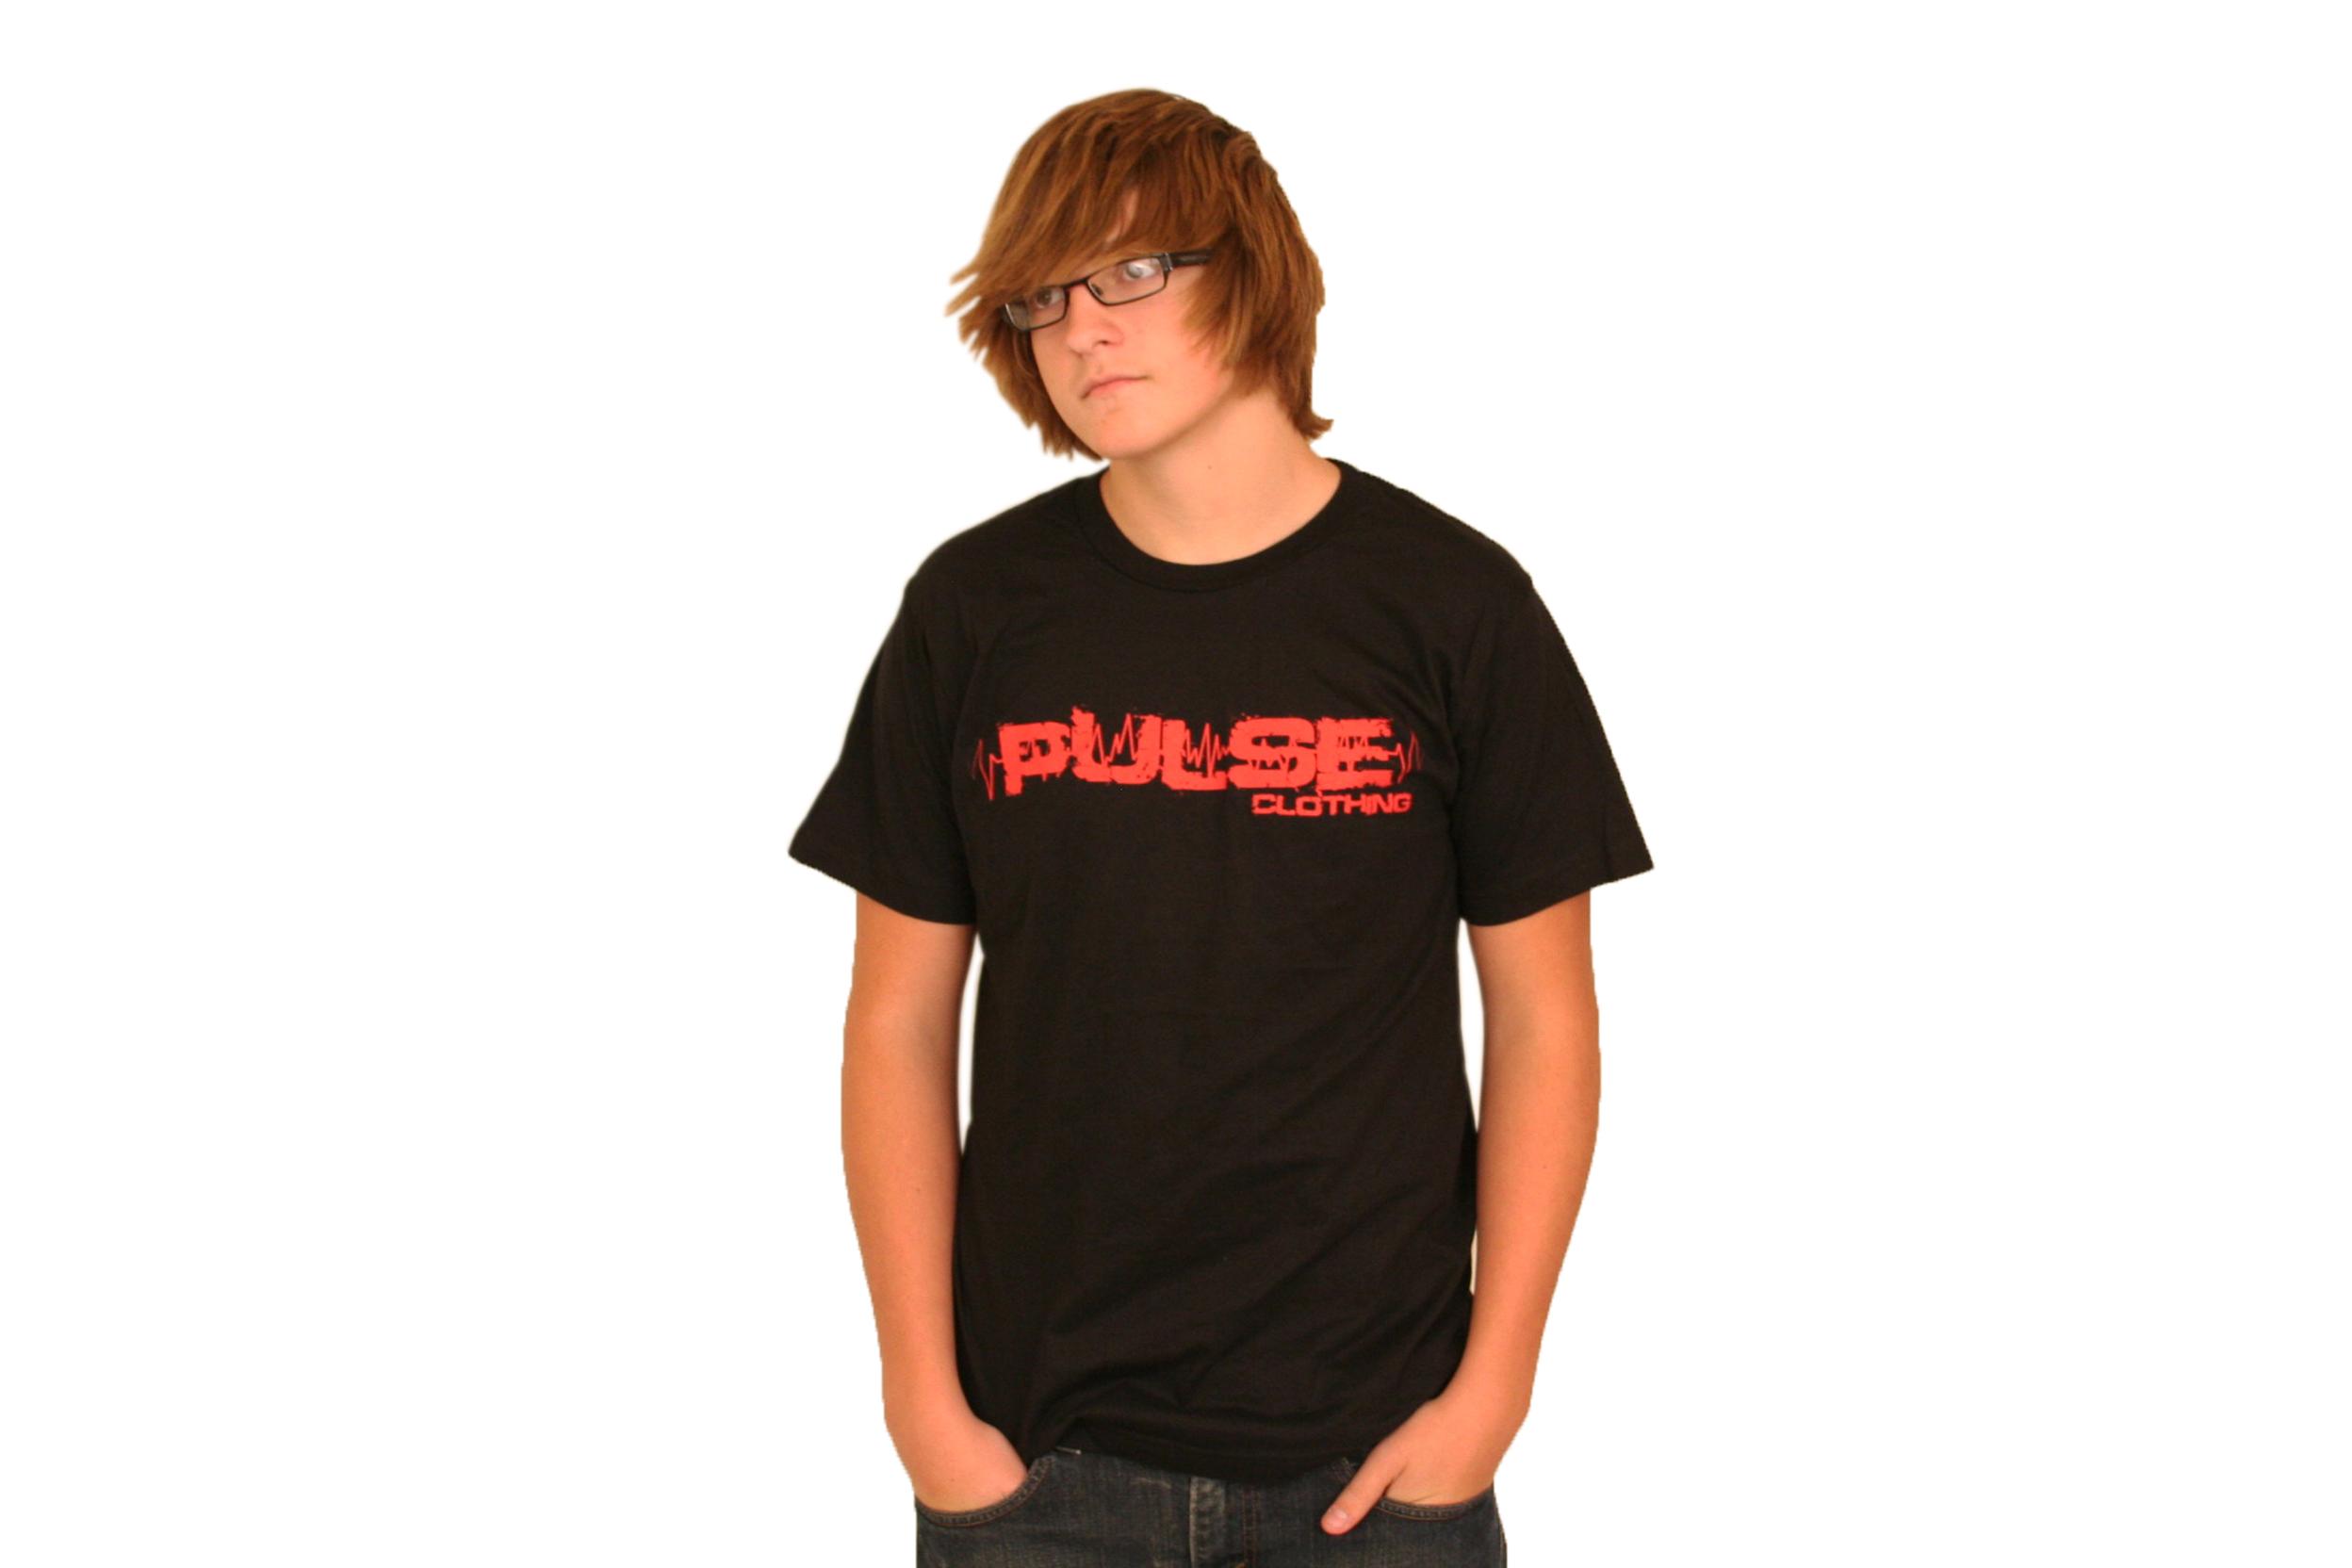 Unisex clothing stores online